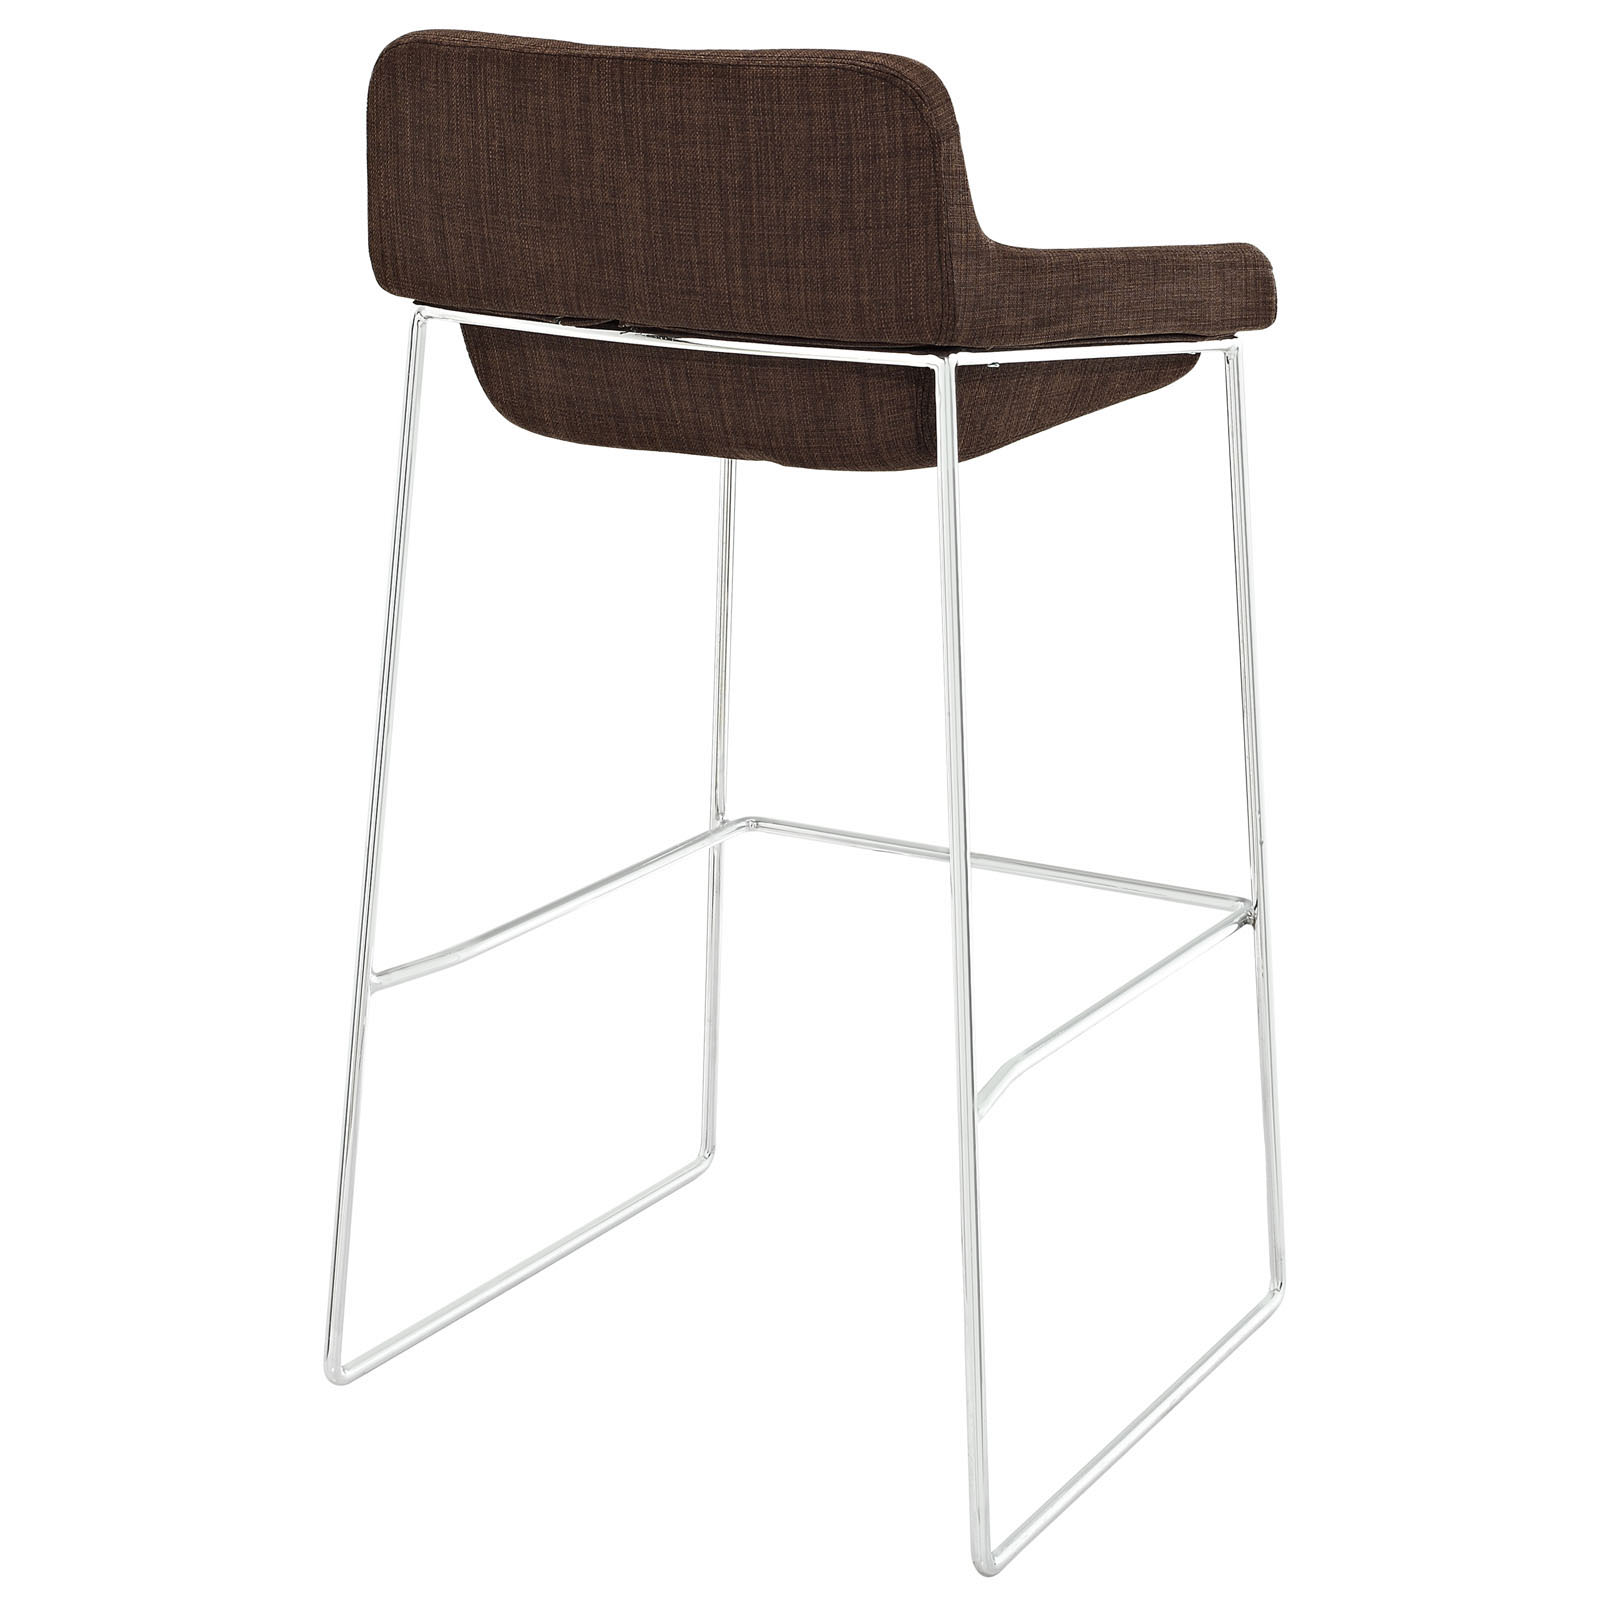 stool chair rentals goodform aluminum navy bar event furniture rental delivery